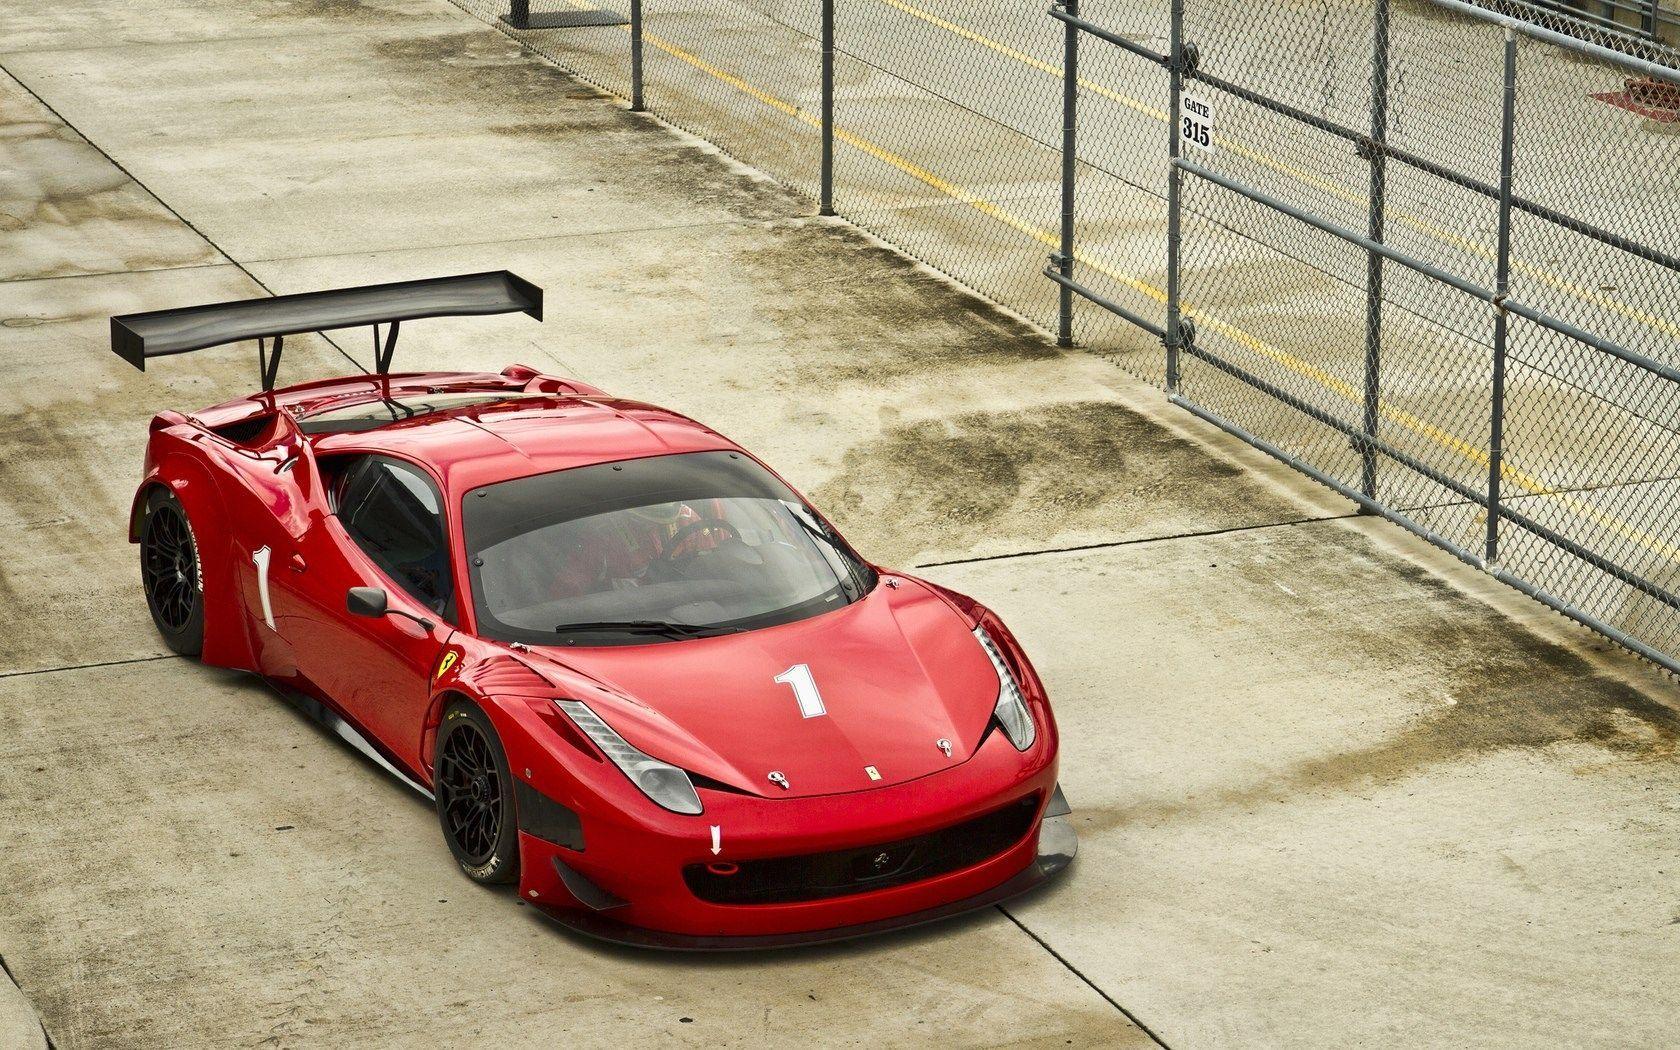 Ferrari 458 Wallpaper 22 1680x1050